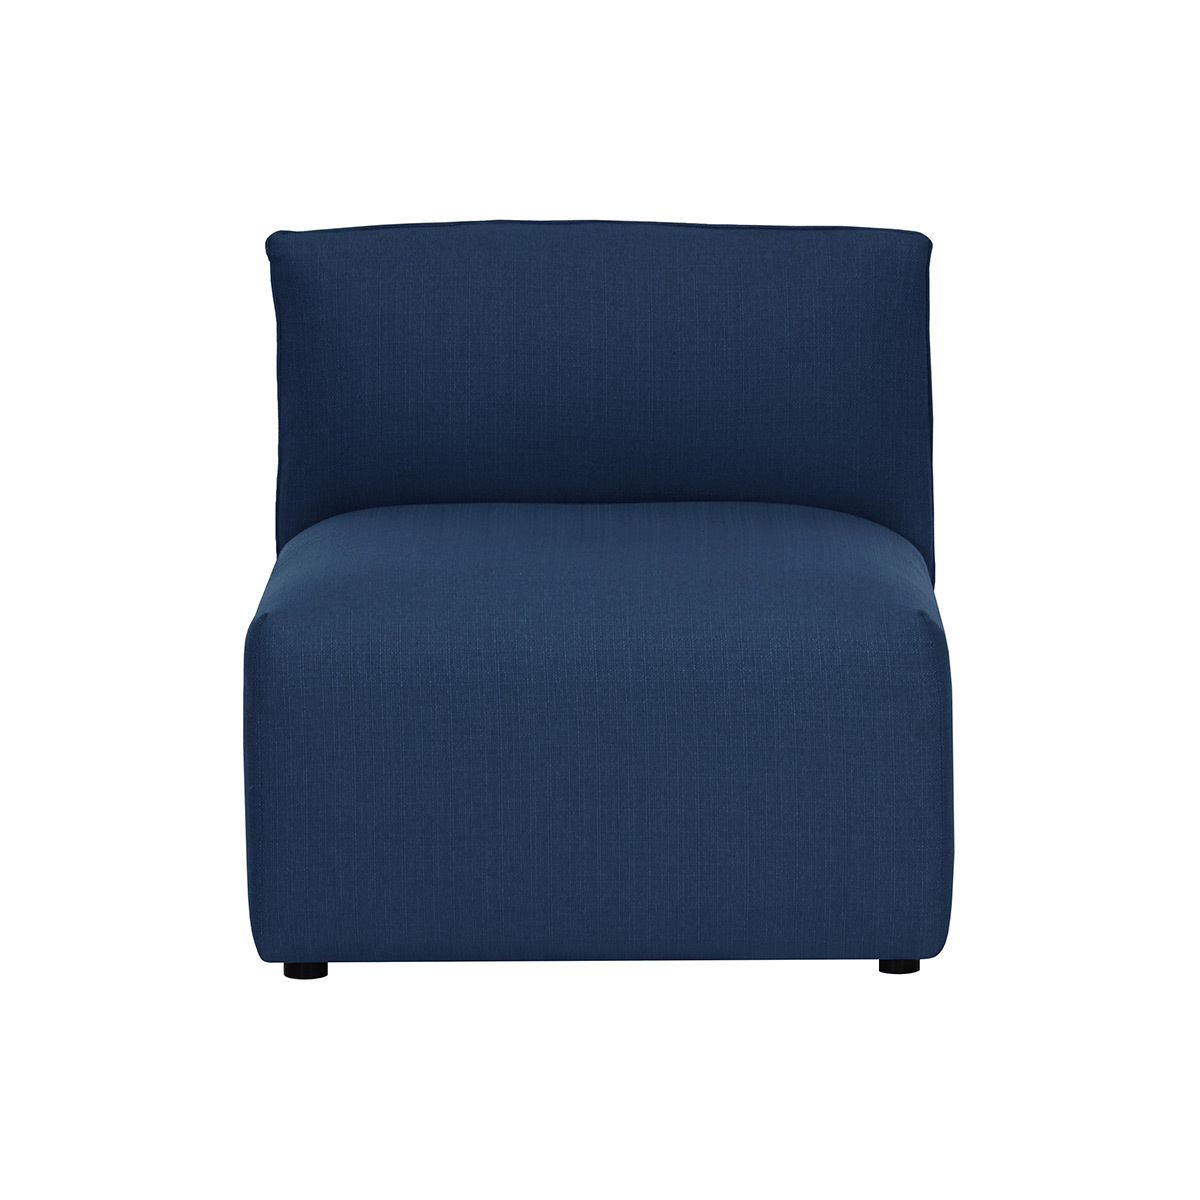 Miliboo Chauffeuse design tissu bleu foncé MODULO